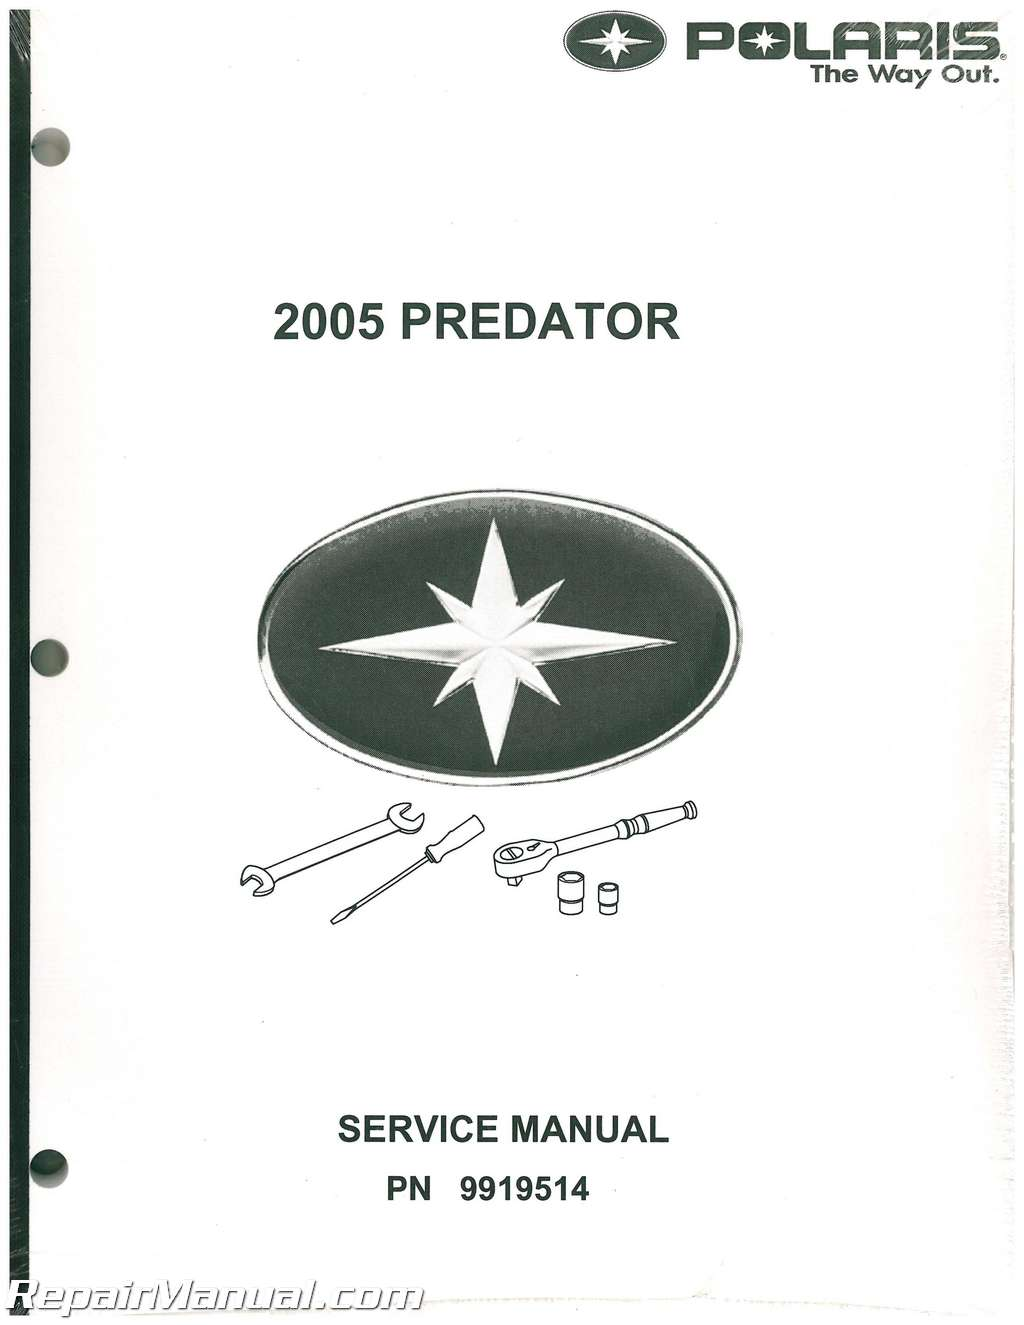 2005 polaris predator 500 service manual rh repairmanual com 2005 polaris sportsman 500 ho service manual pdf 2005 polaris sportsman 500 ho owner's manual